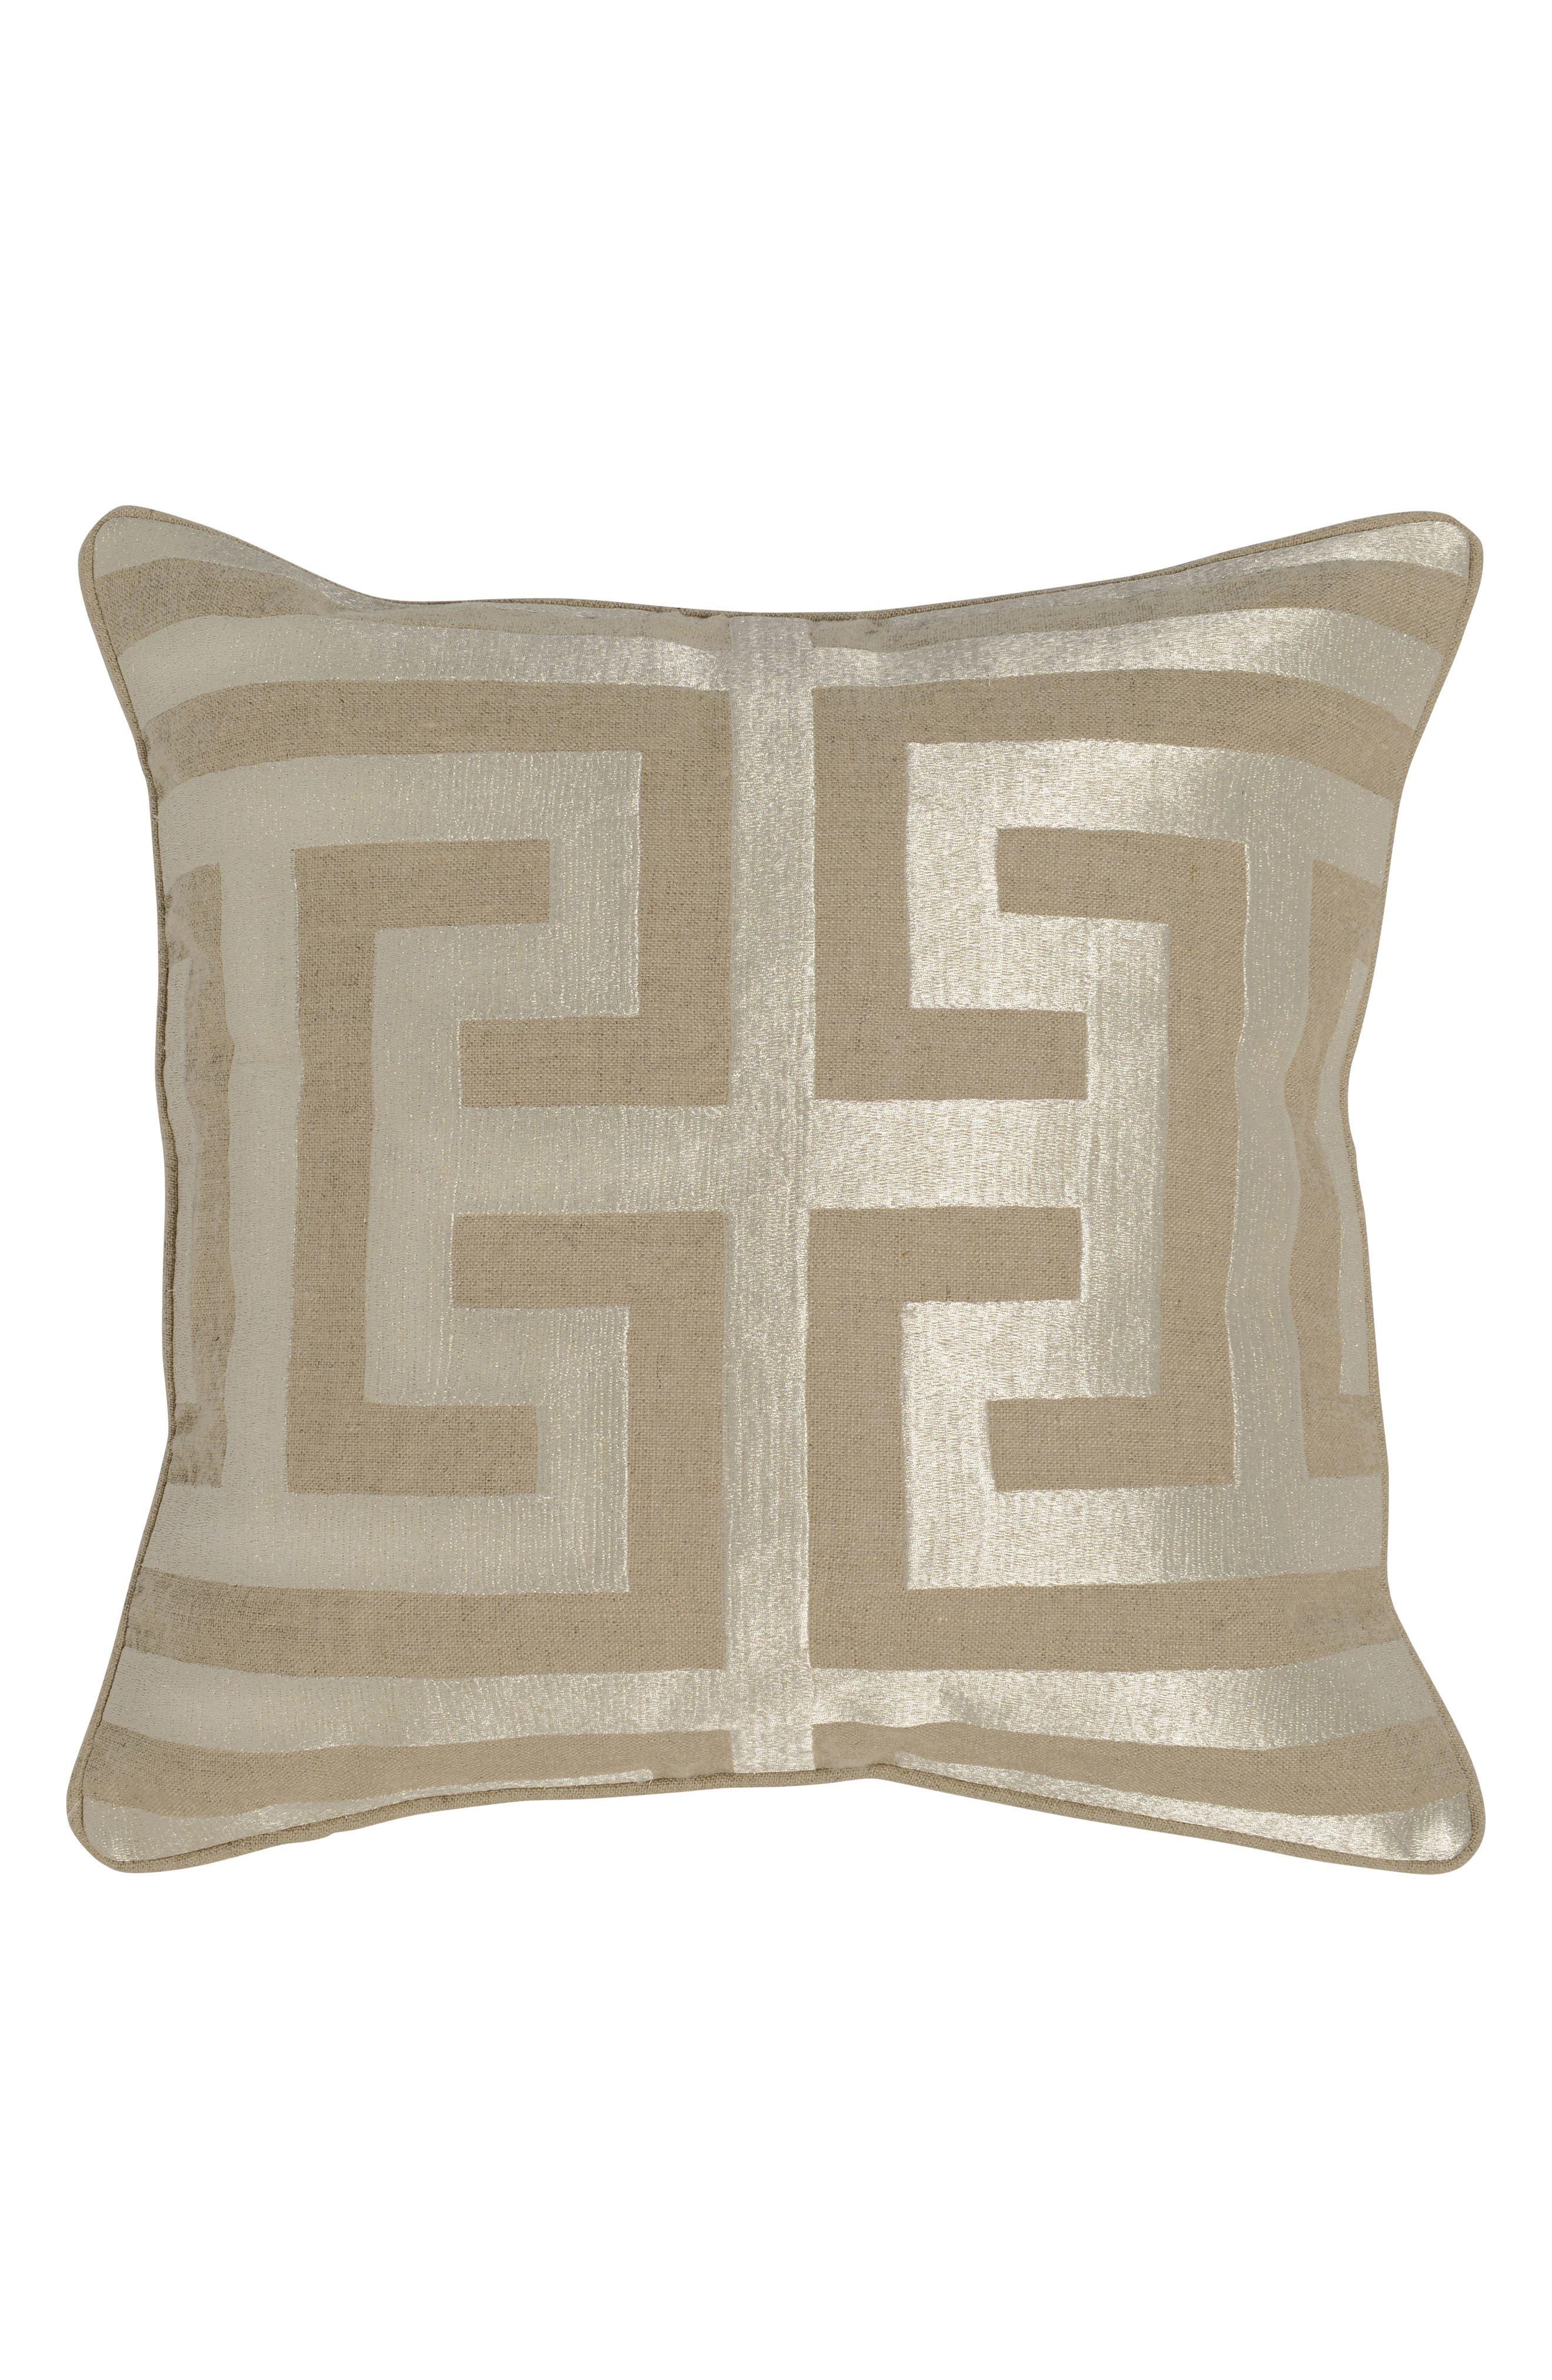 'Capital' Decorative Pillow,                         Main,                         color, Natural/ Silver